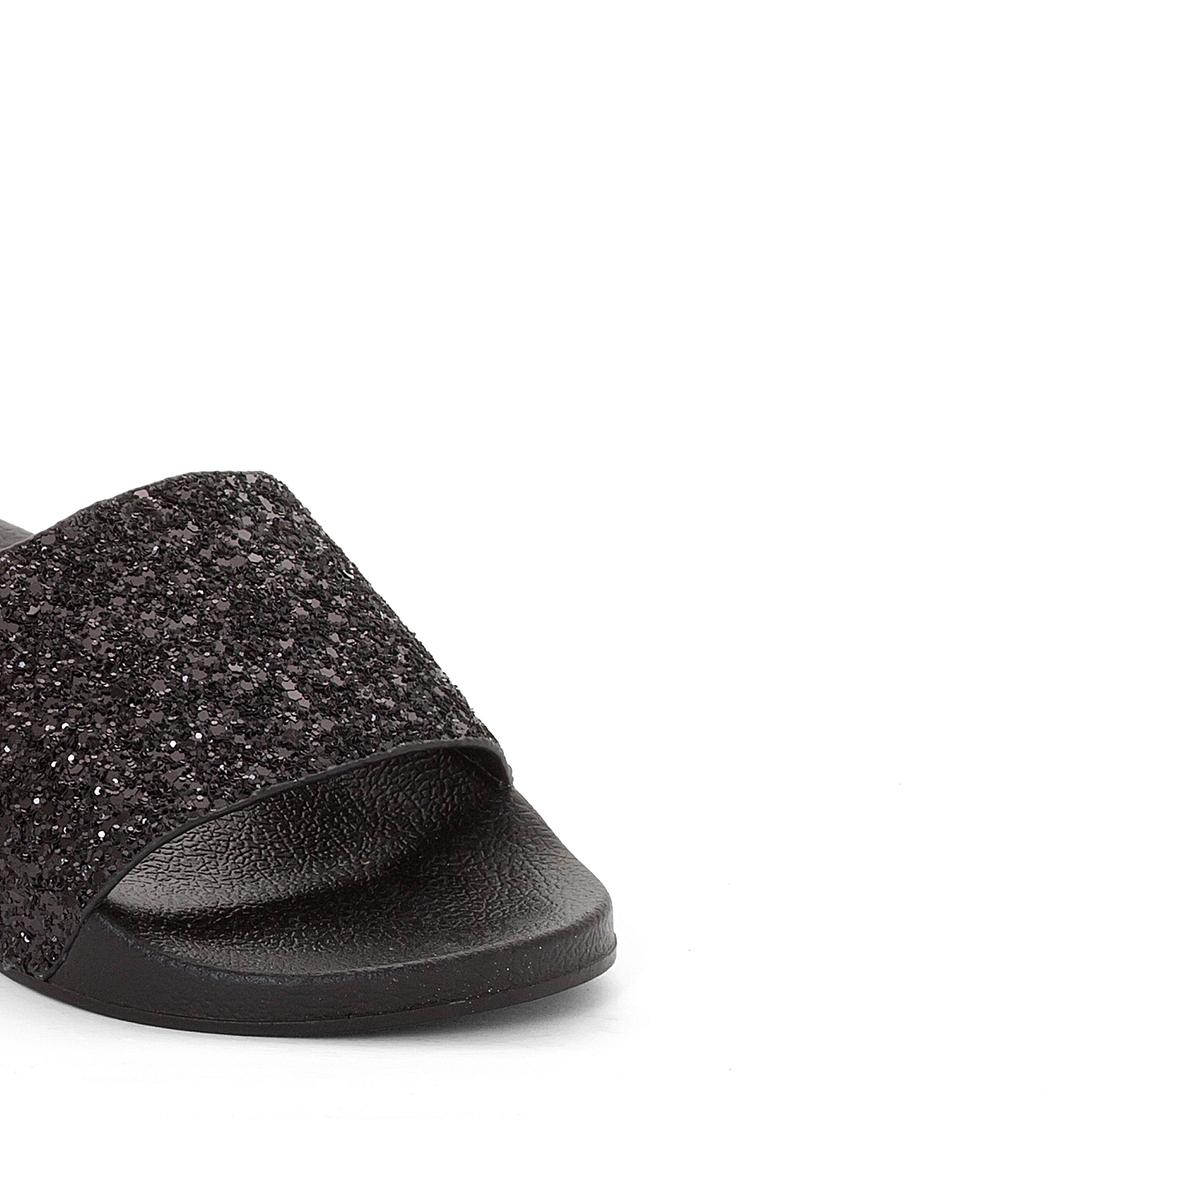 Туфли без задника блестящие WaikikiВерх/Голенище : Синтетический материал с блесткамиПодкладка : синтетика  Стелька : синтетика  Подошва : синтетика   Форма каблука : плоский каблук  Мысок : закругленный.  Застежка : без застежки<br><br>Цвет: черный